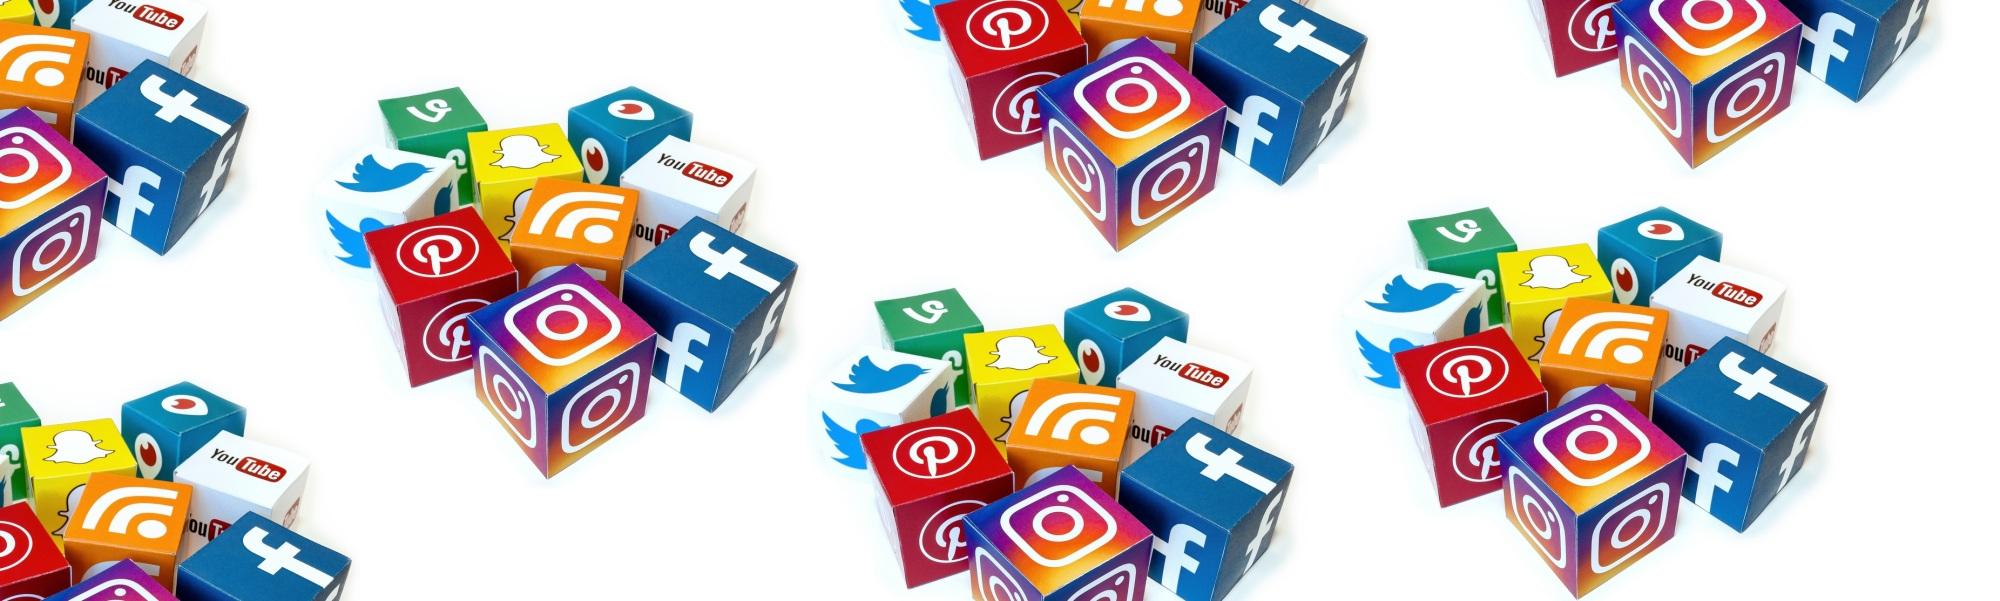 Areti Vassou Digital Marketing Strategy